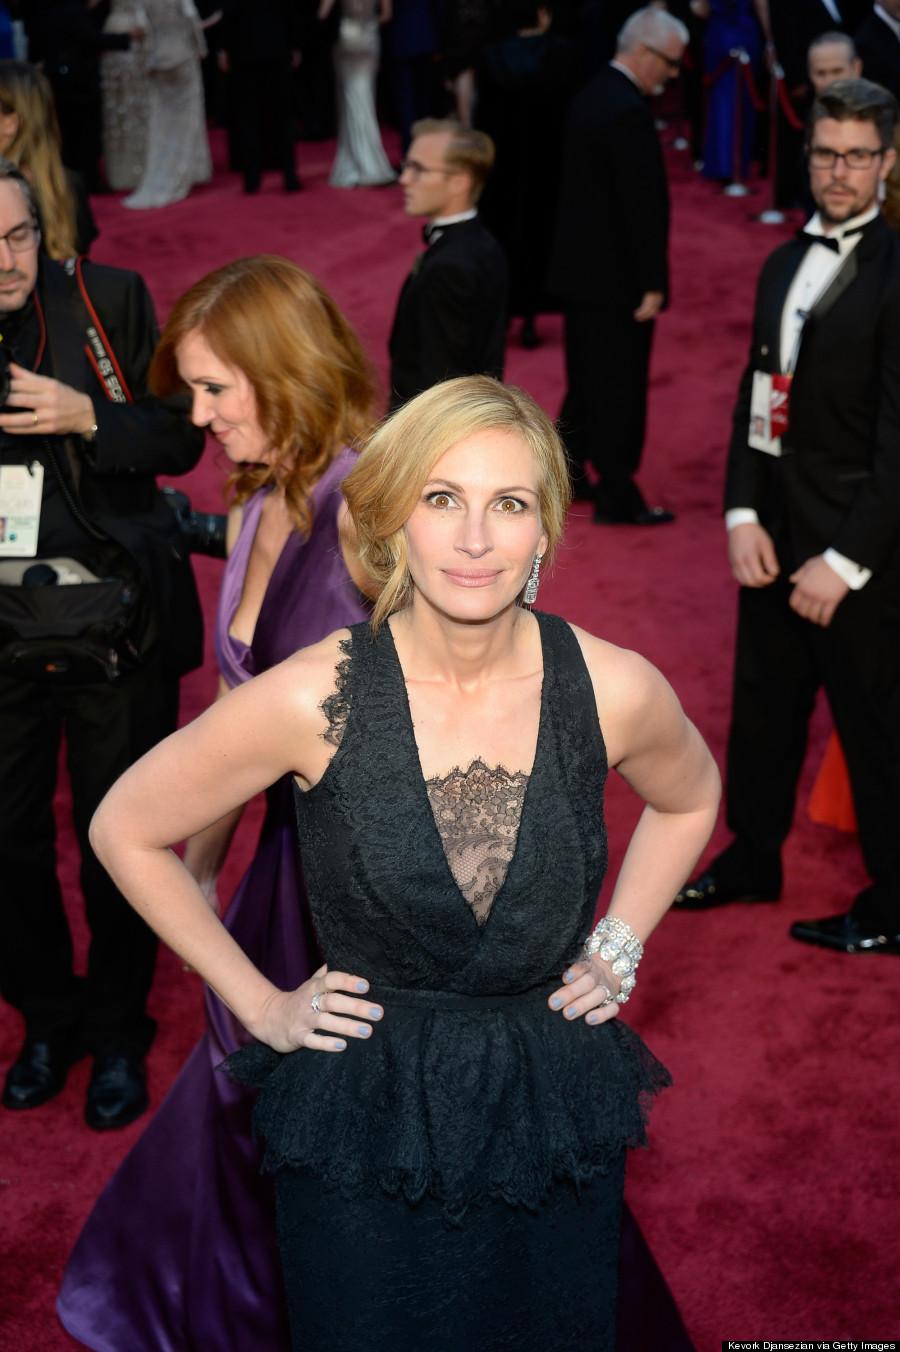 Julia Roberts Hair Color On Ellen - Viewing Gallery Brad Pitt News